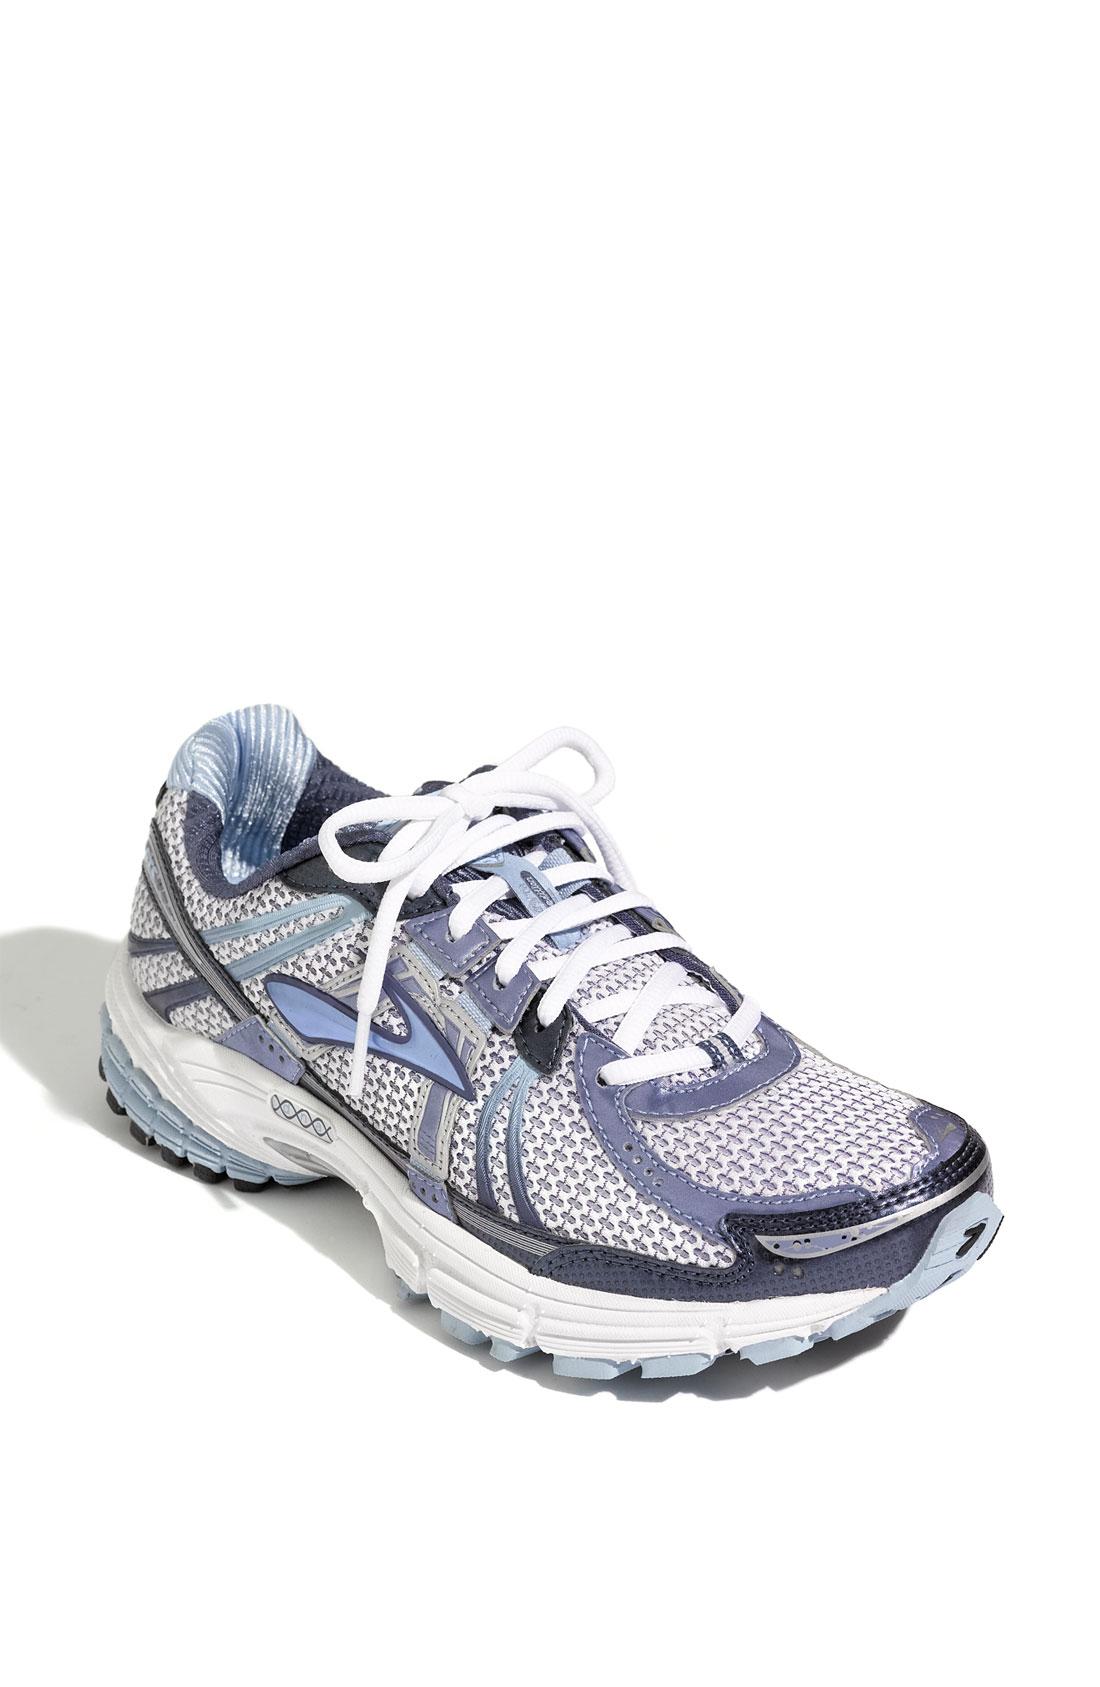 Adidas Adrenaline Running Shoes